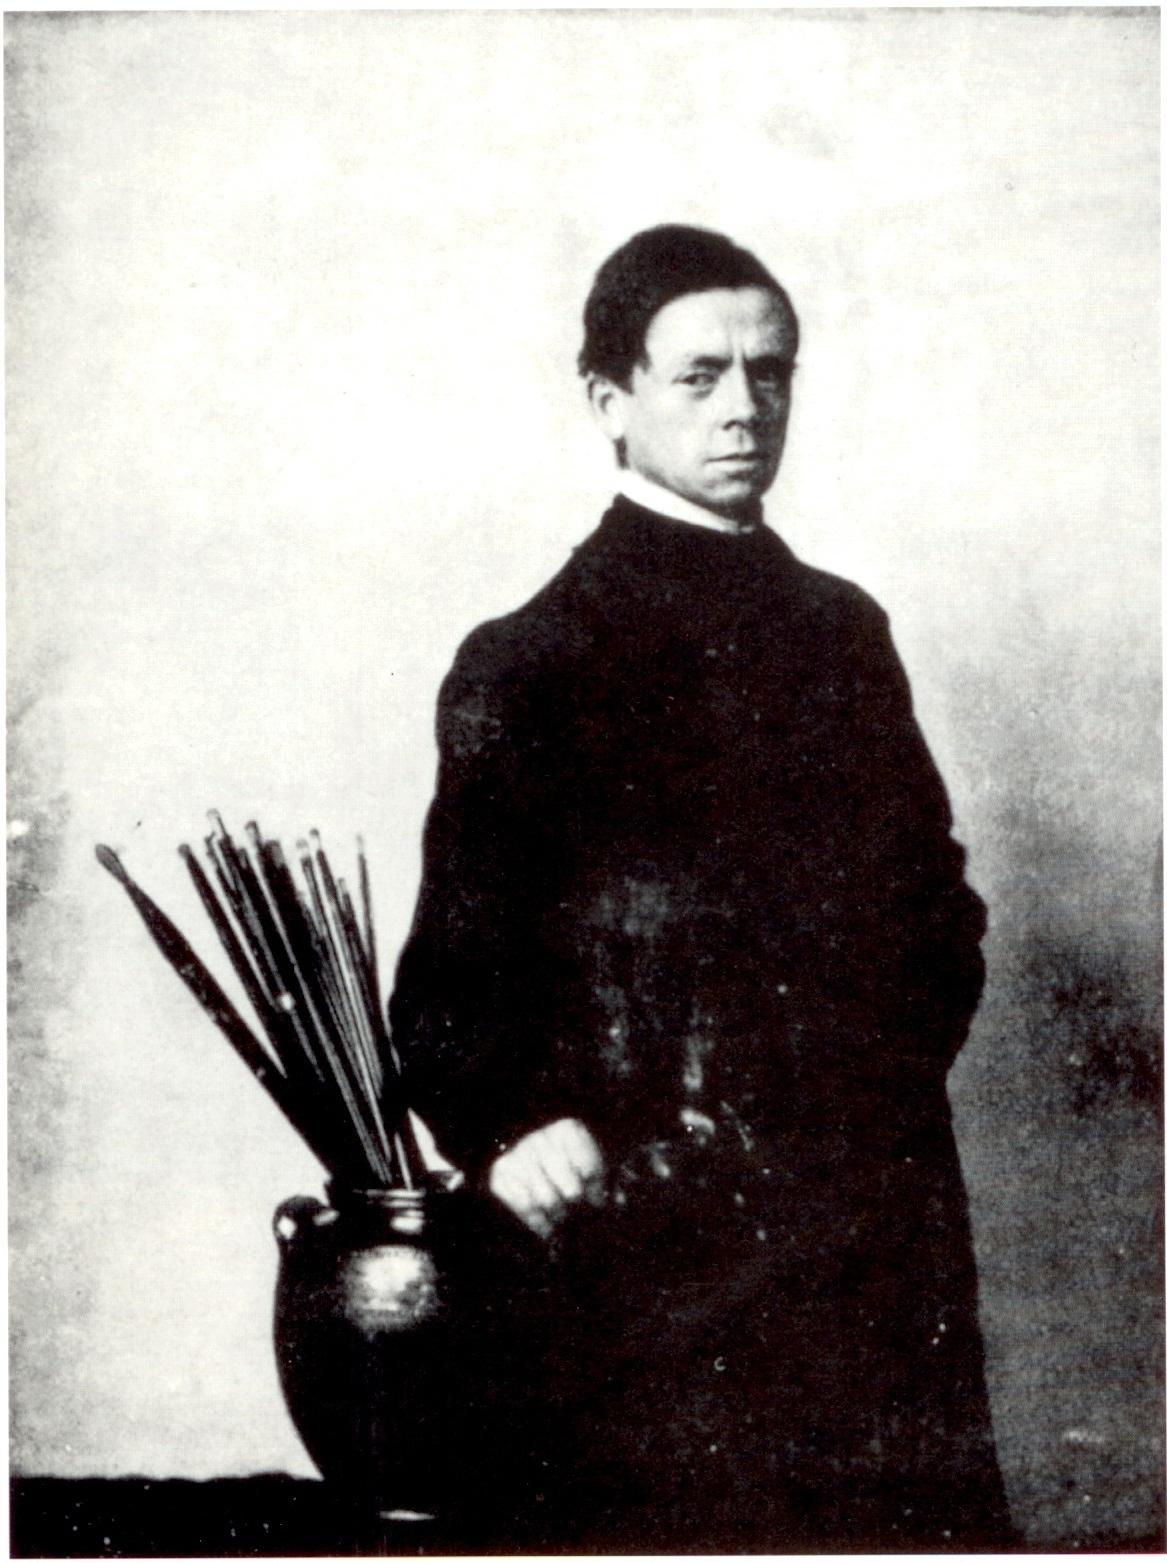 Portrait of William Nicholson, Malcolm Arbuthnot, 1912